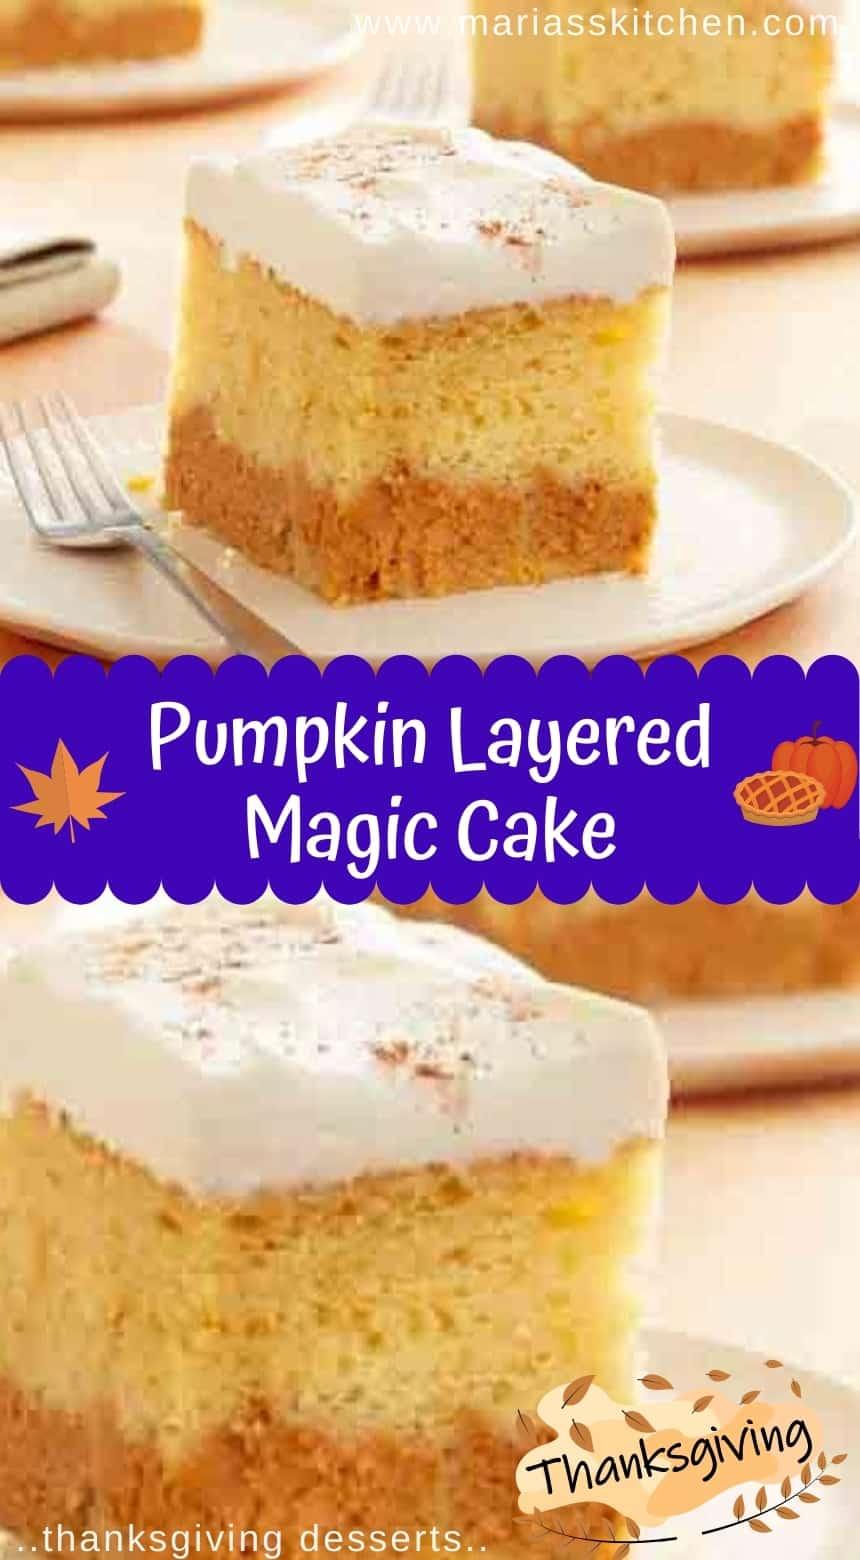 Delicious Pumpkin Layered Magic Cake - Thanksgiving Desserts